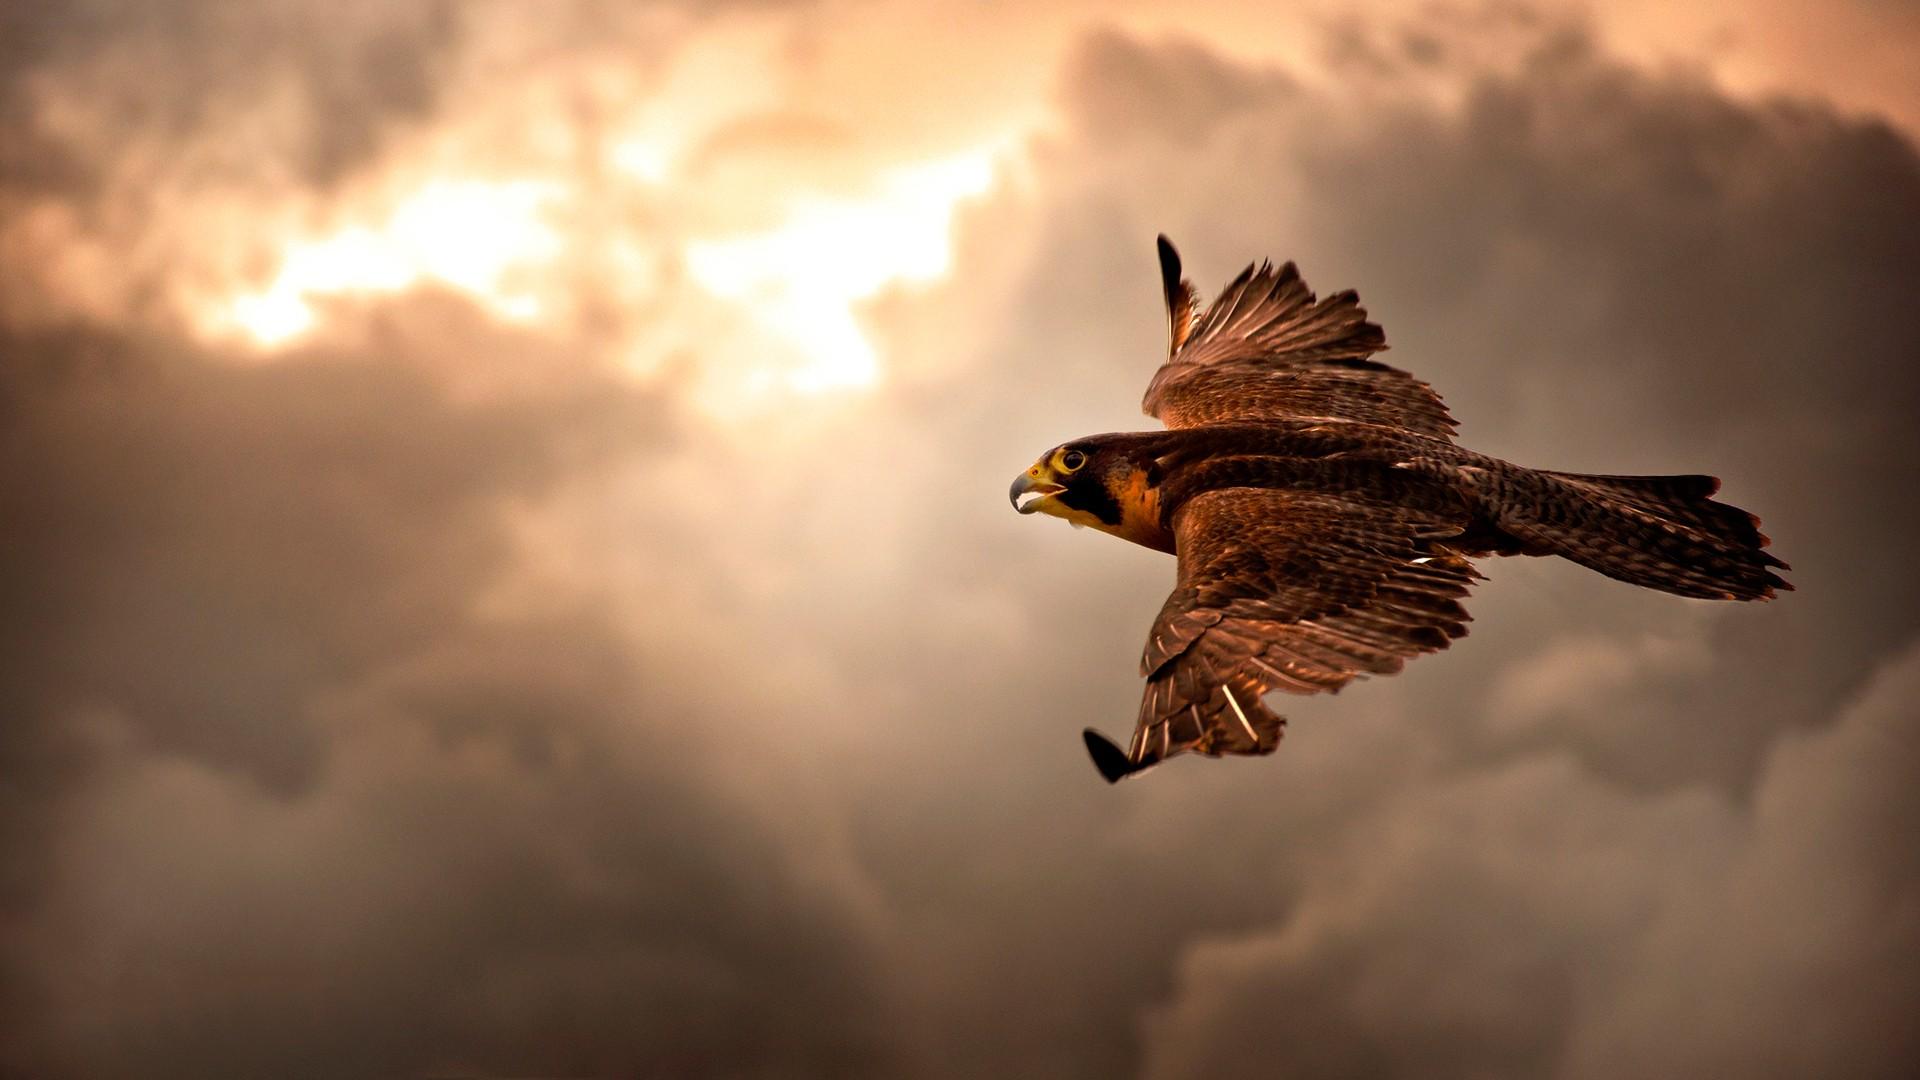 Brown Eagle in flight HD Wallpaper FullHDWpp   Full HD Wallpapers 1920x1080